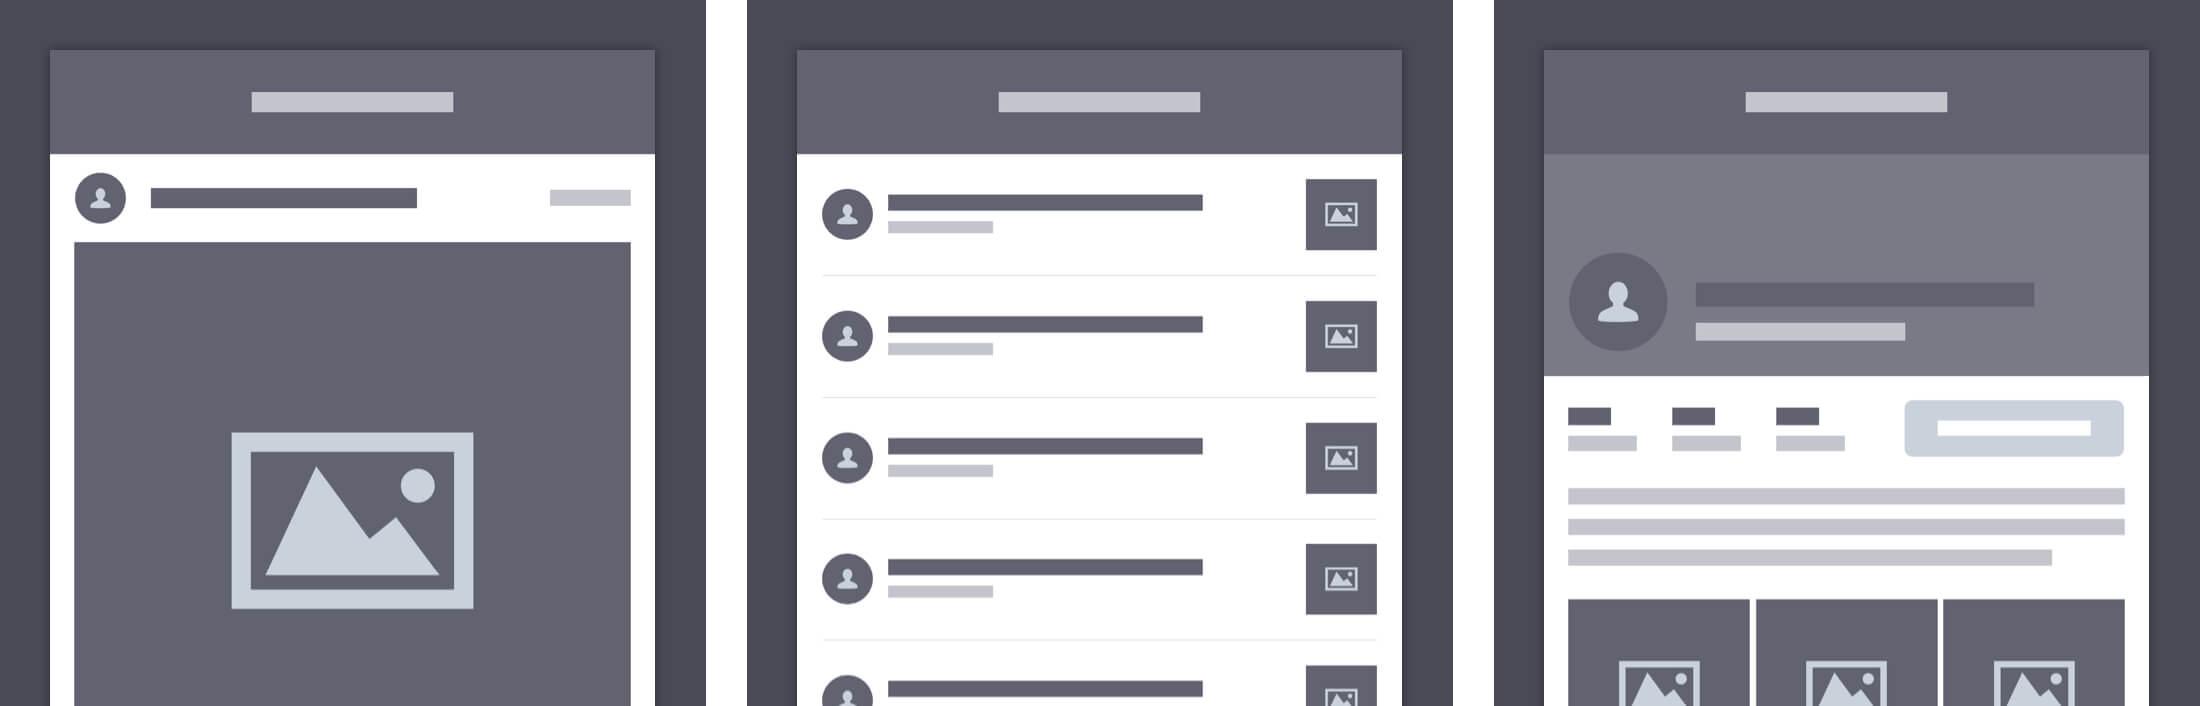 Instagram Redesign wireframes